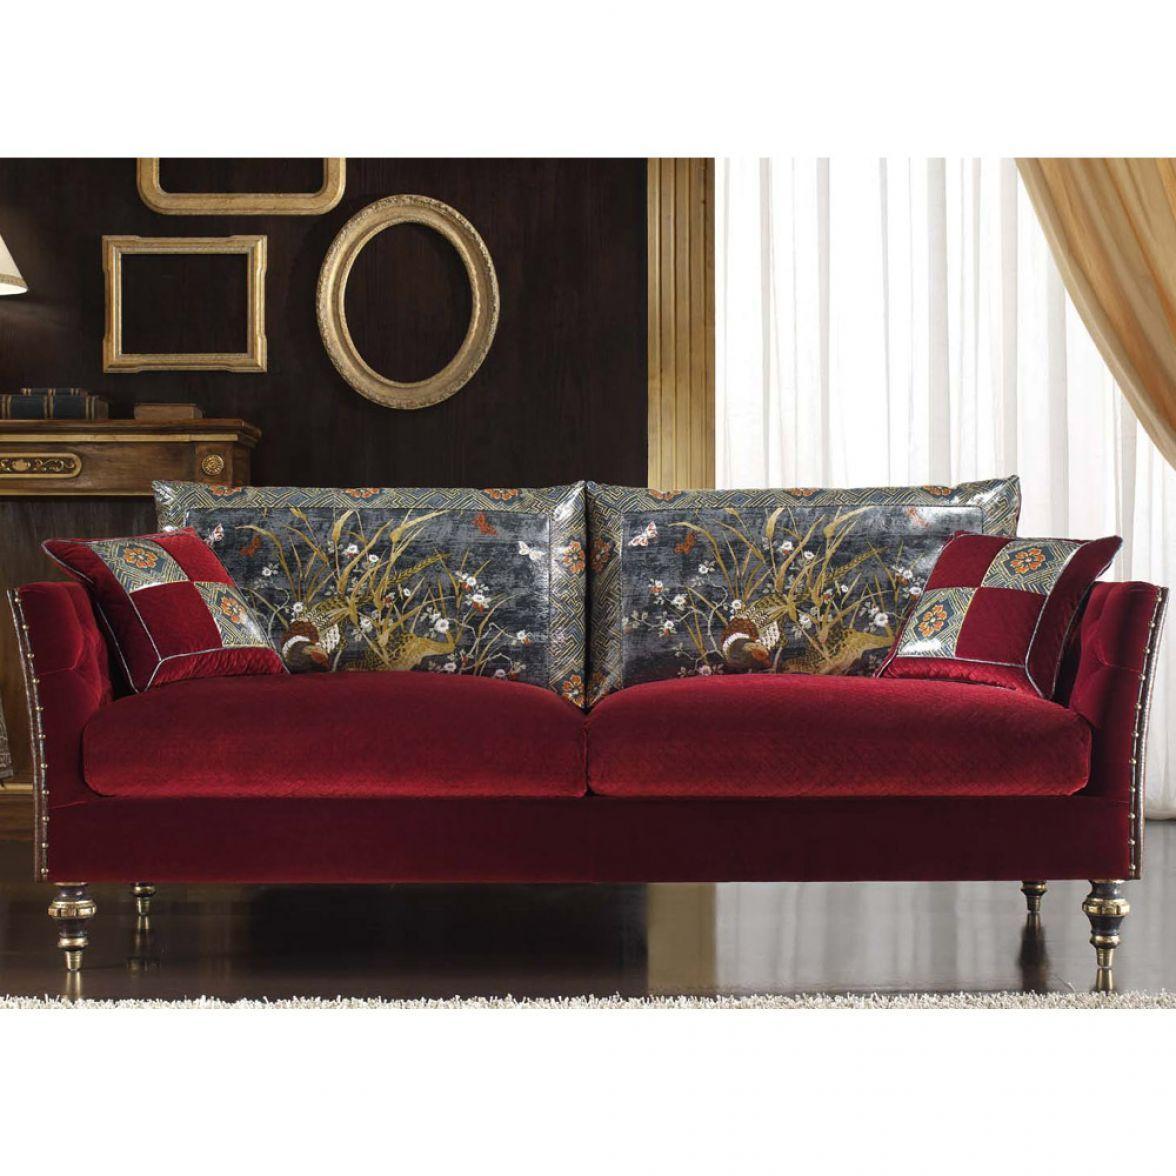 Carnaby sofa